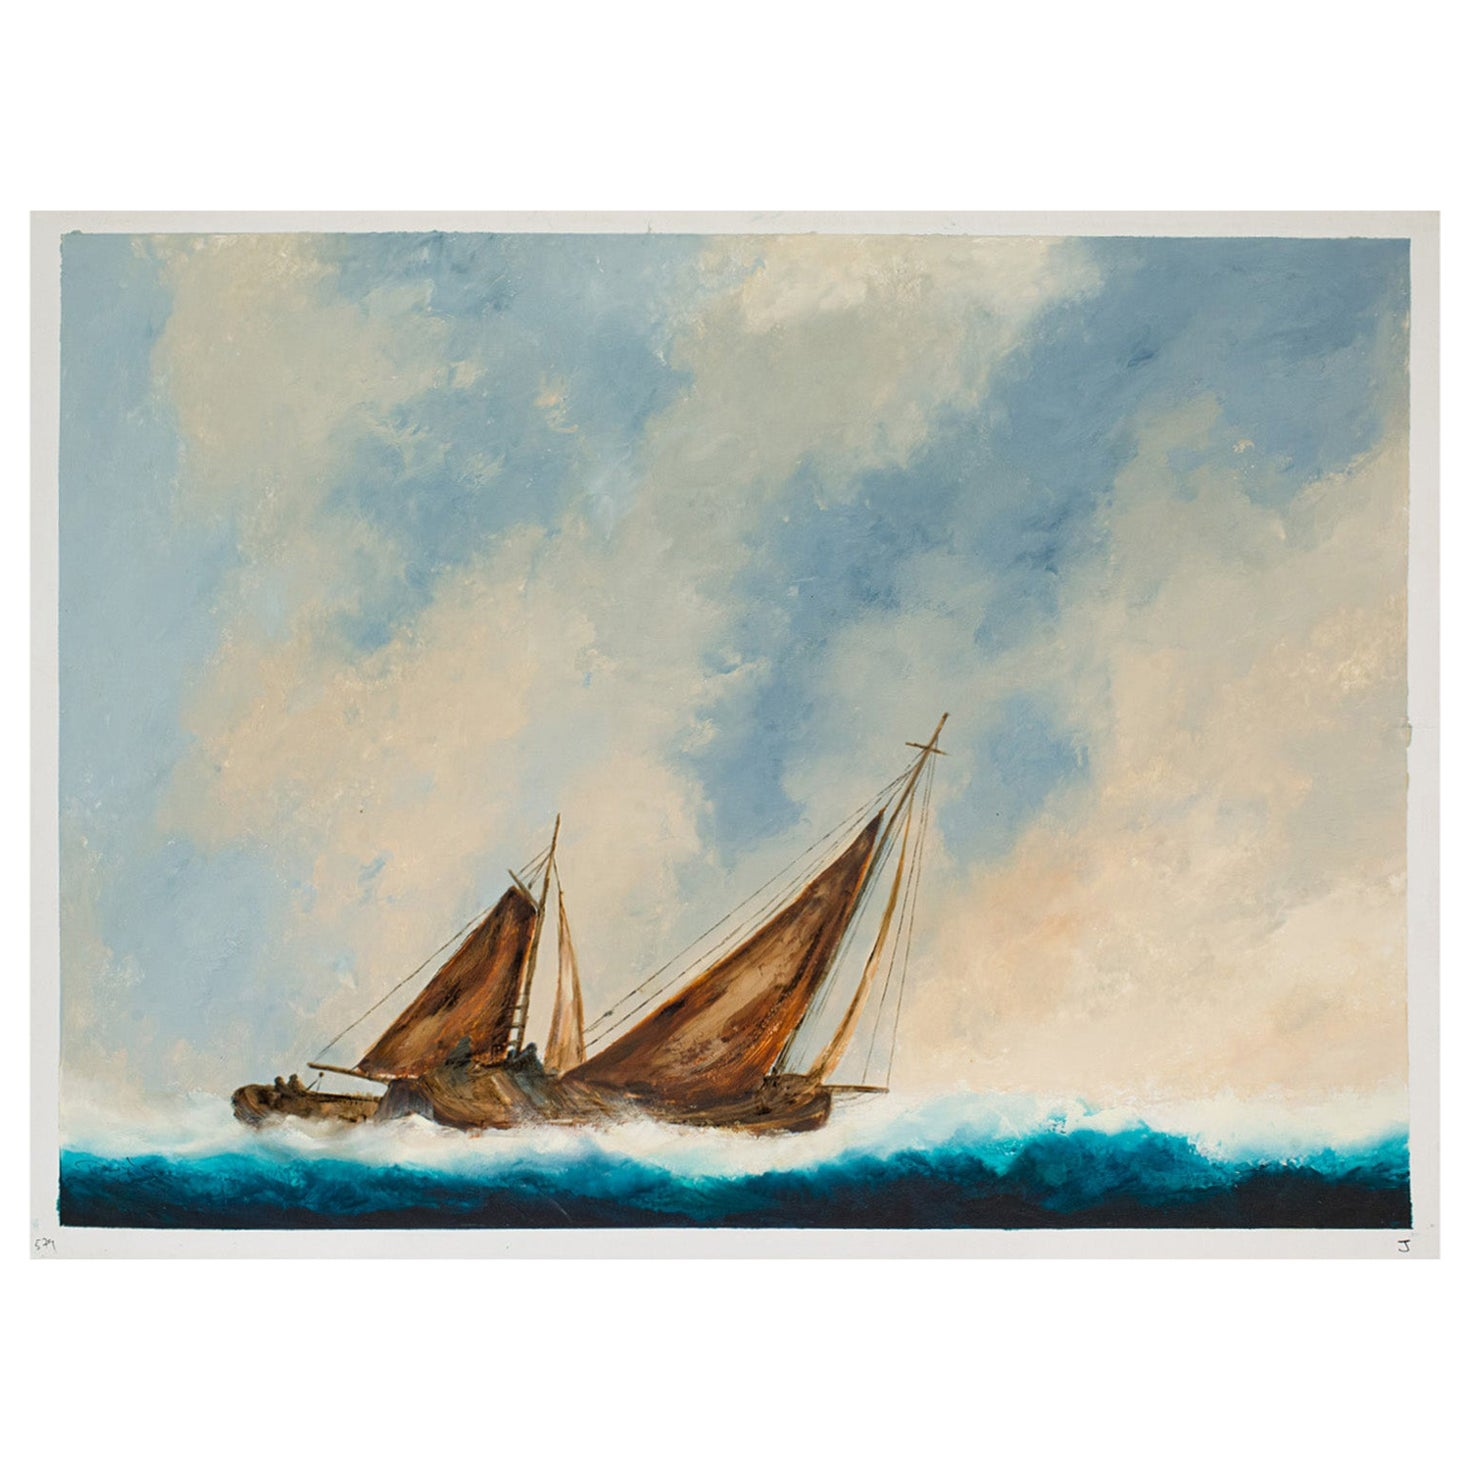 Large Seascape Oil Painting, Vintage Sailing Boat, Marine, Art, Original